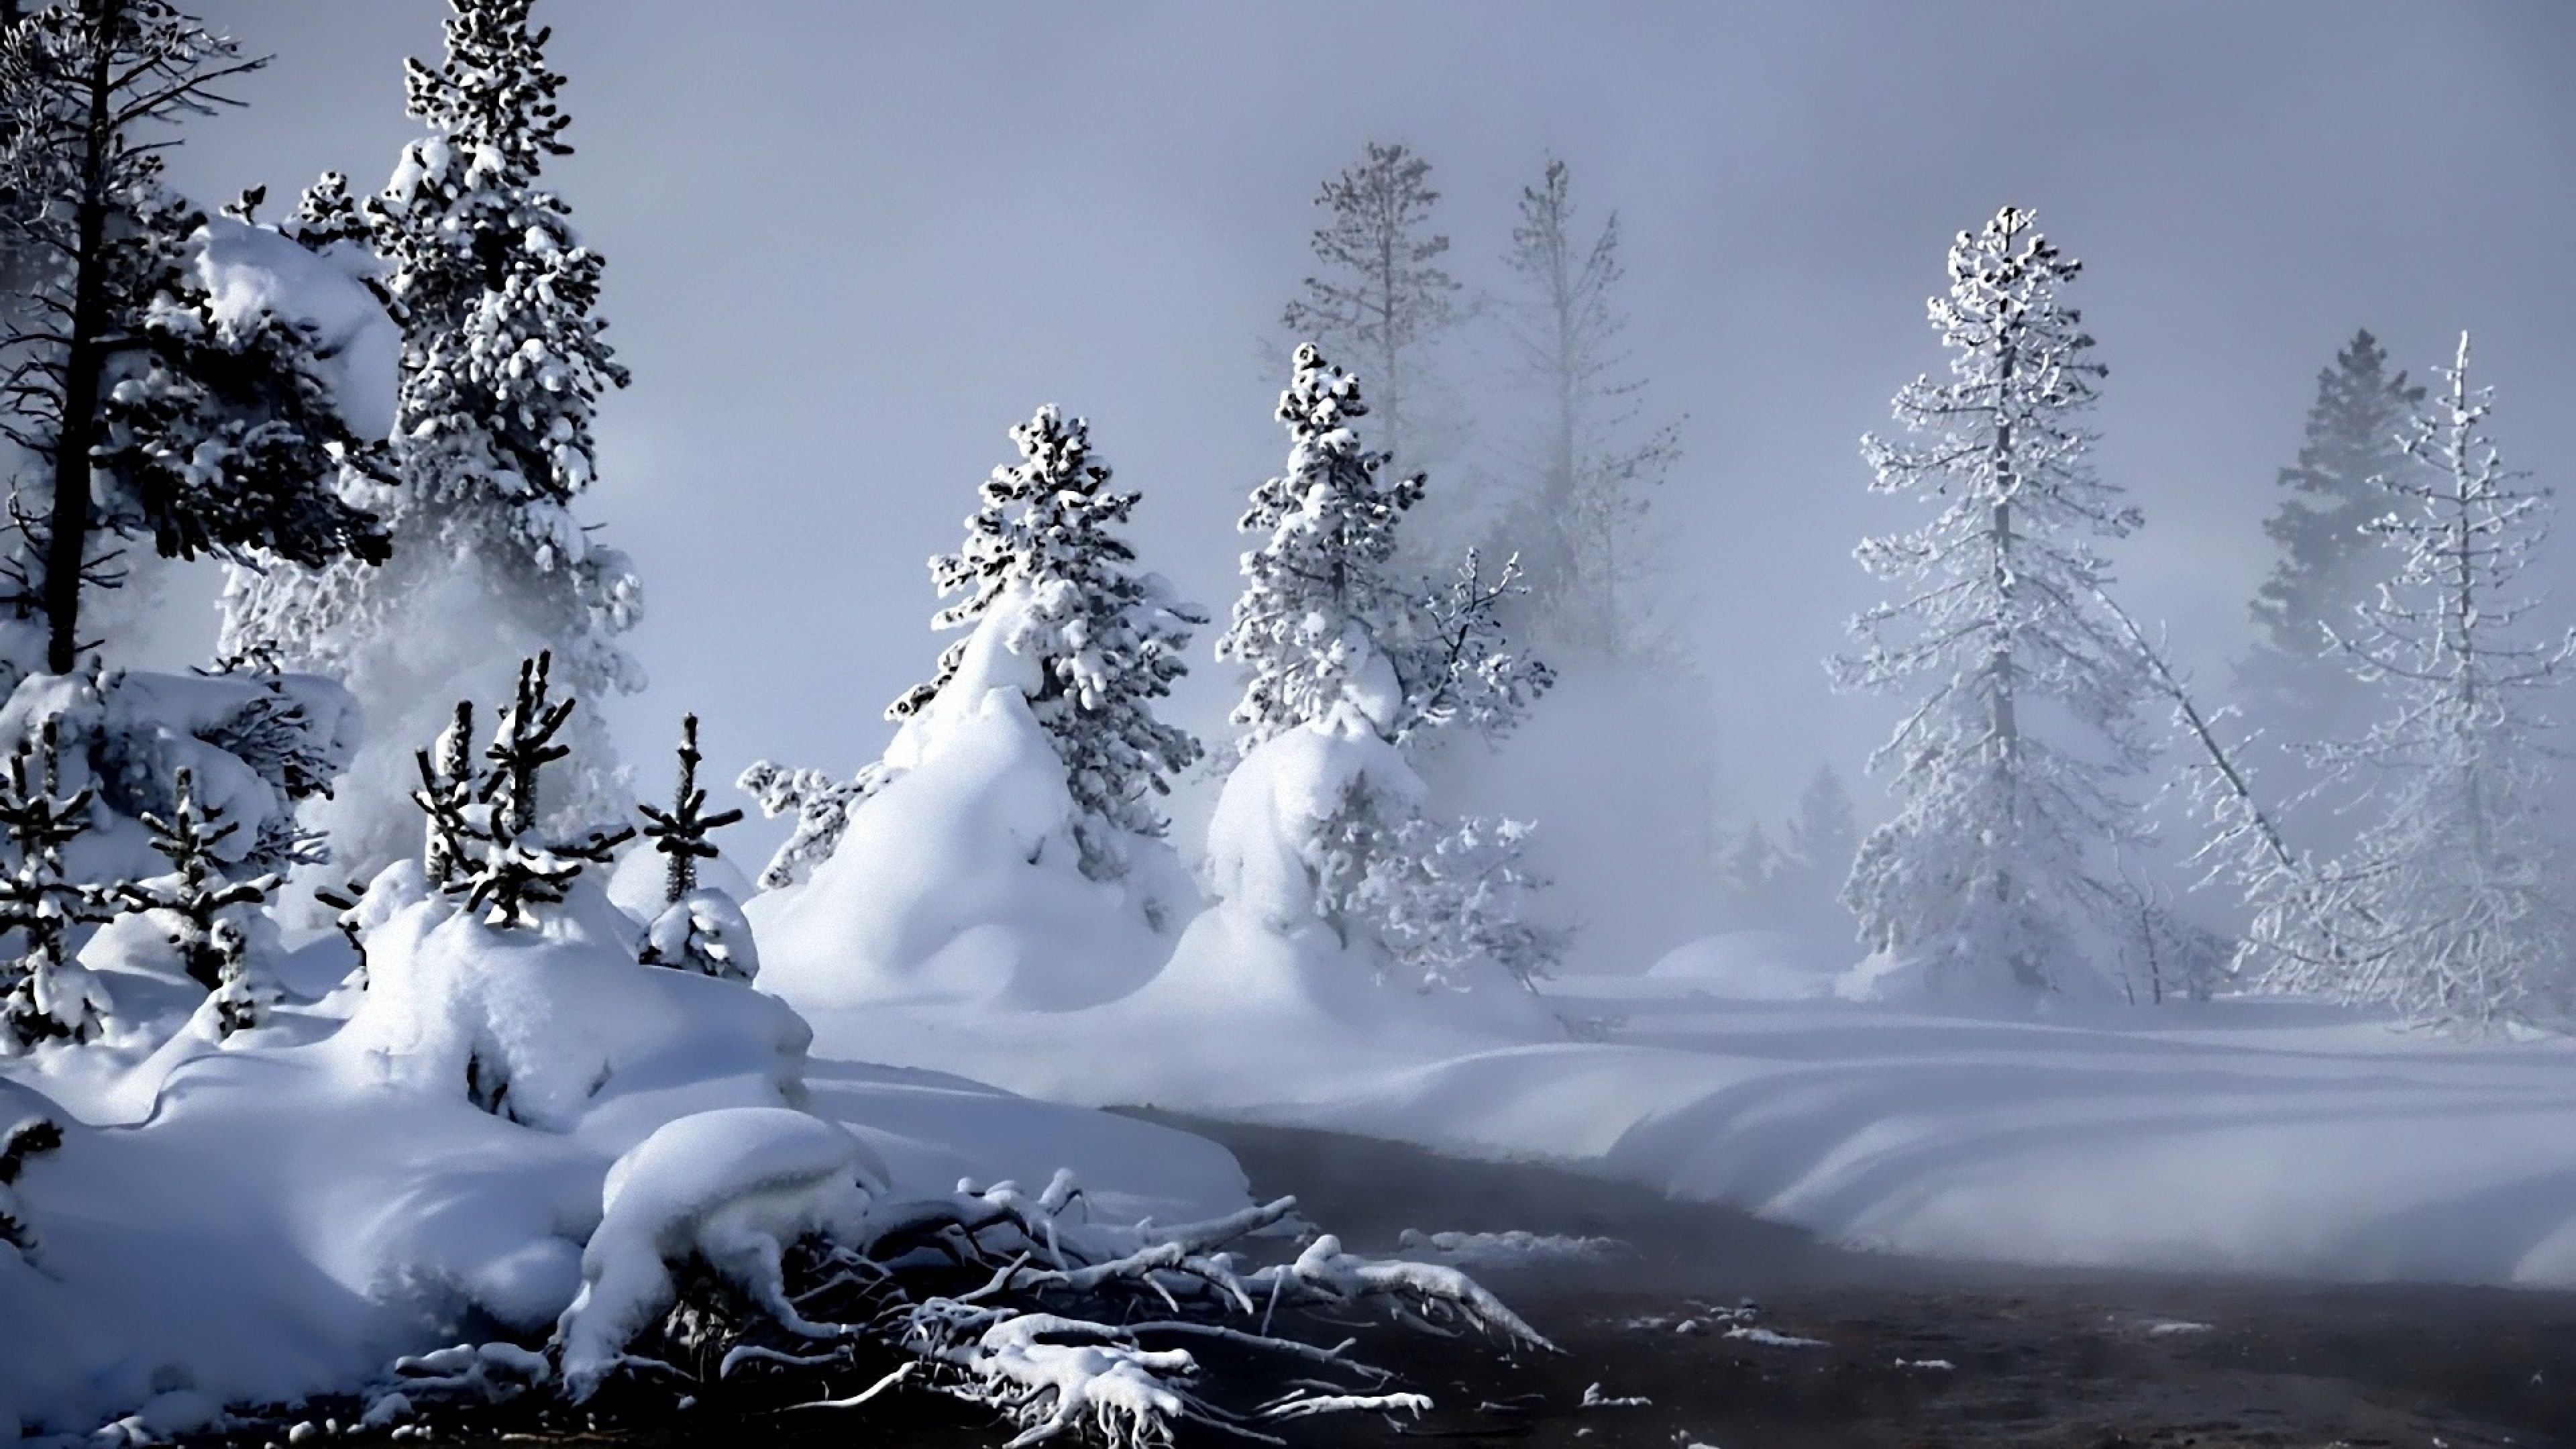 Download Wallpaper 3840x2160 Winter, River, Evaporation